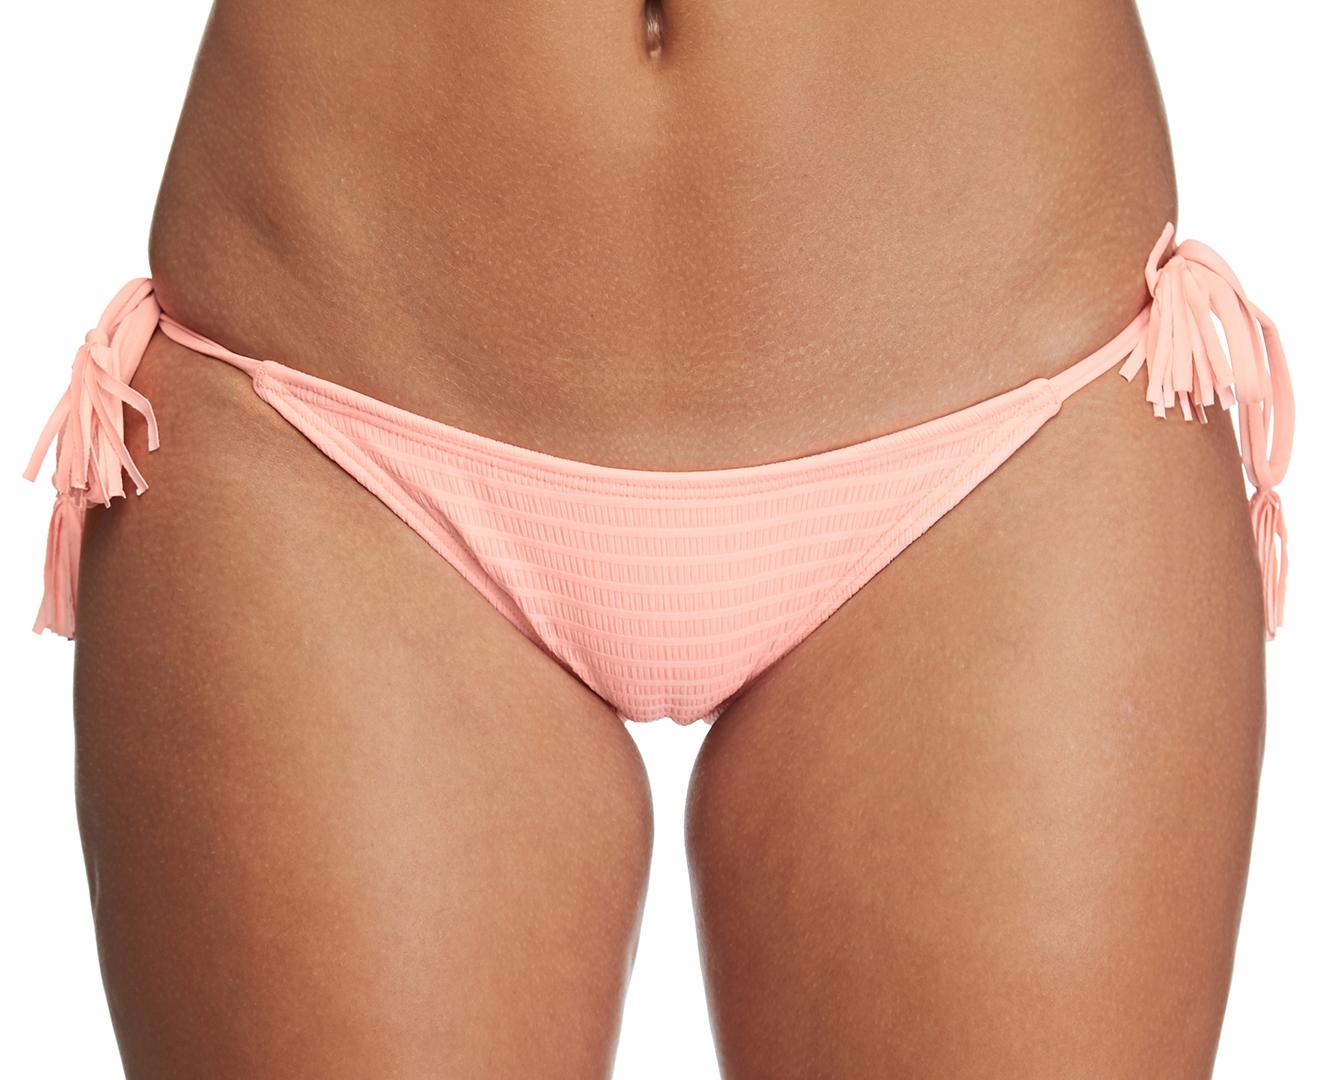 fbf13d5861c1 Billabong Women's Pisces Bikini Set - Musk   Catch.com.au